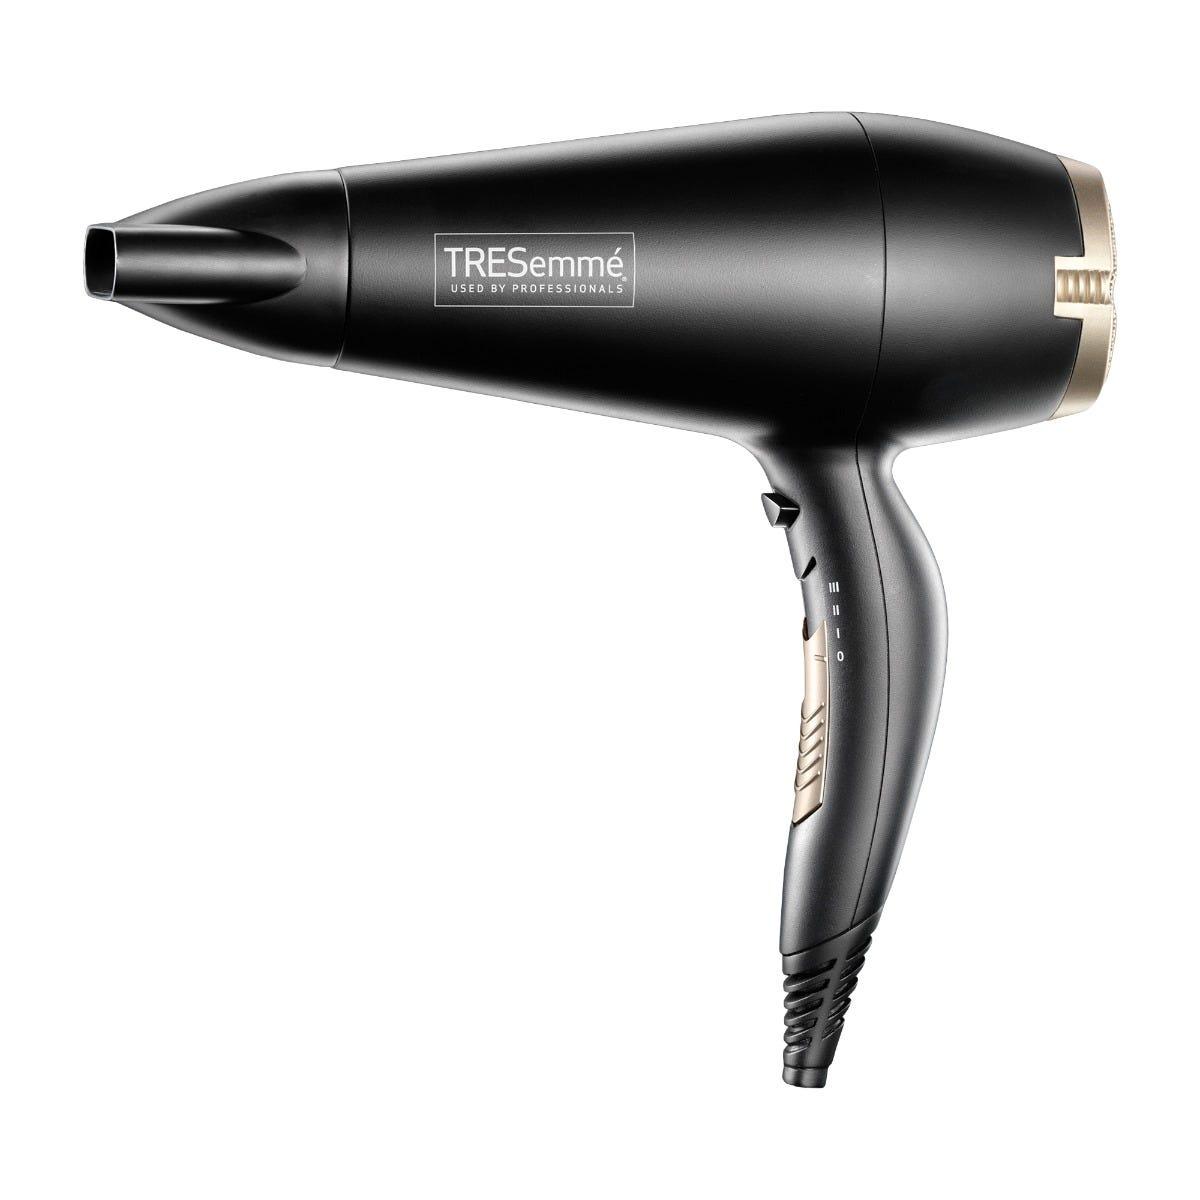 Tresemme TR5543 2200W Salon Professional Hairdryer - Black